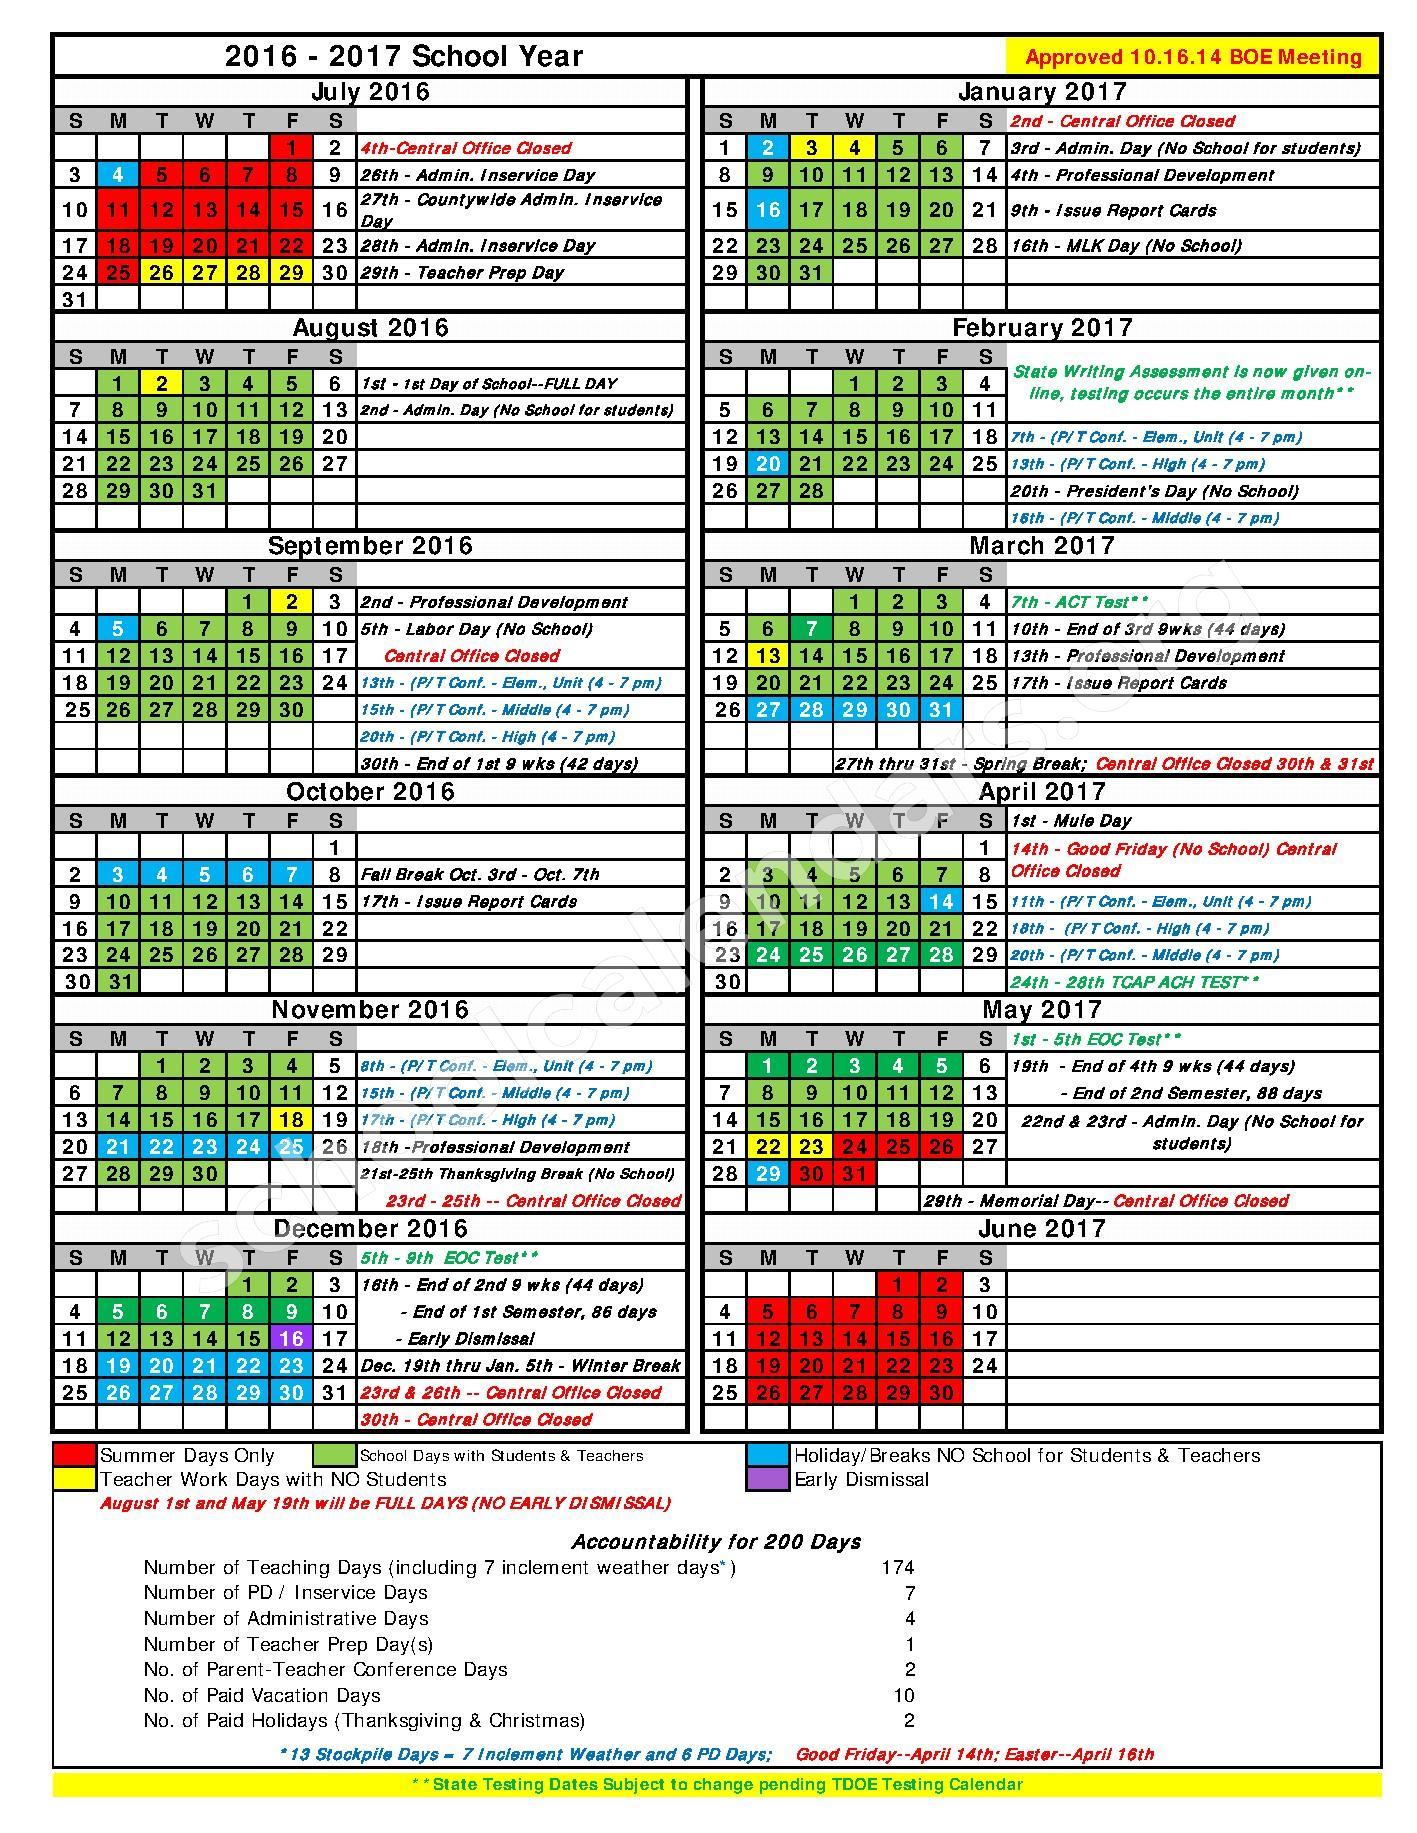 2016 - 2017 School Calendar – Highland Park Elementary School – page 1